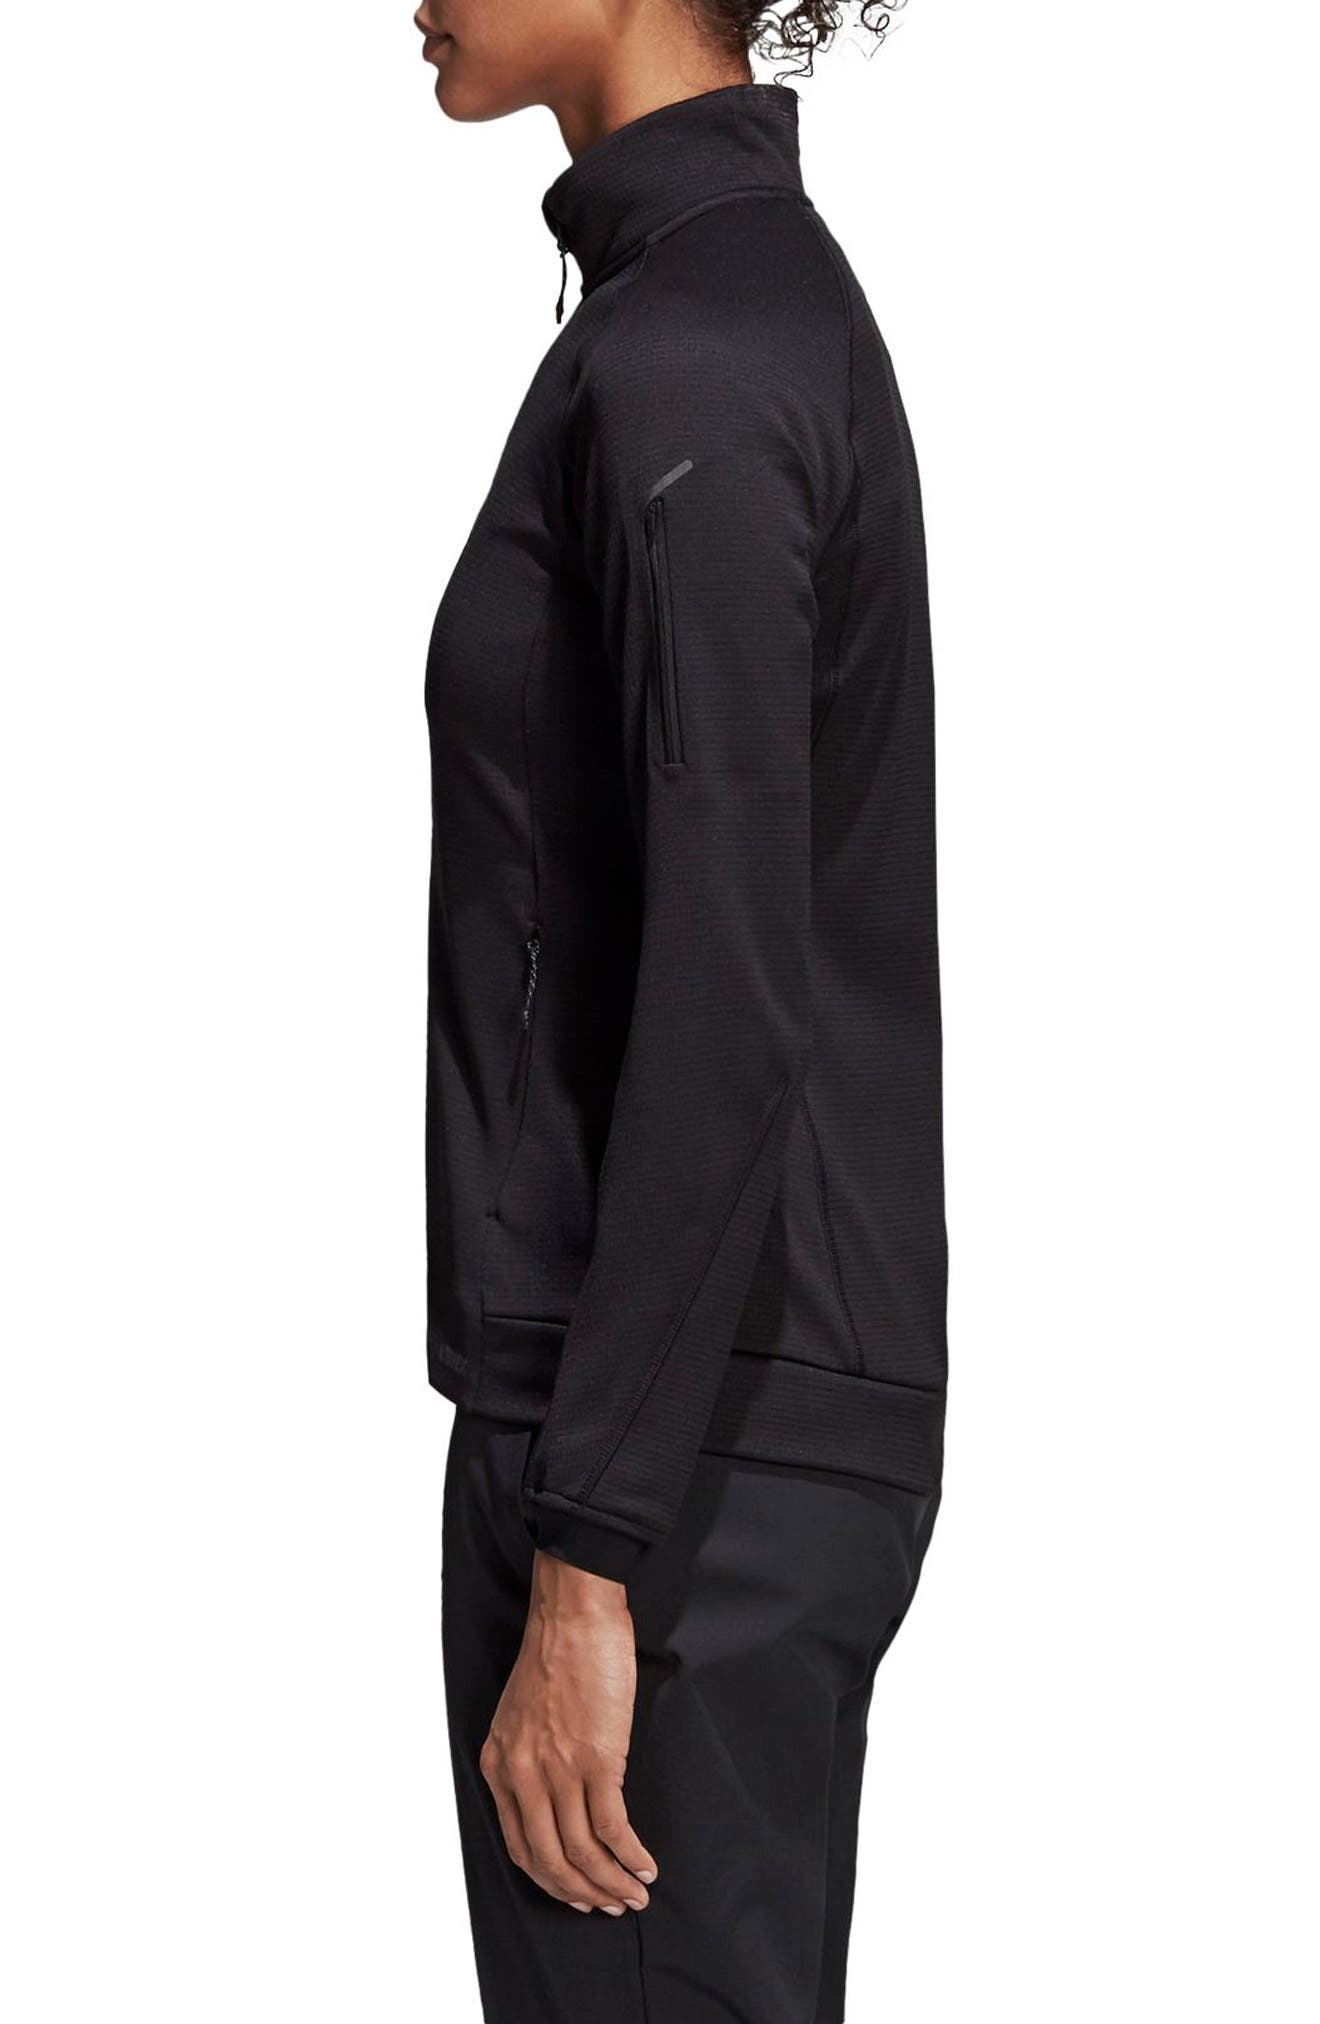 ADIDAS, Stockhorn Fleece Jacket, Alternate thumbnail 4, color, BLACK